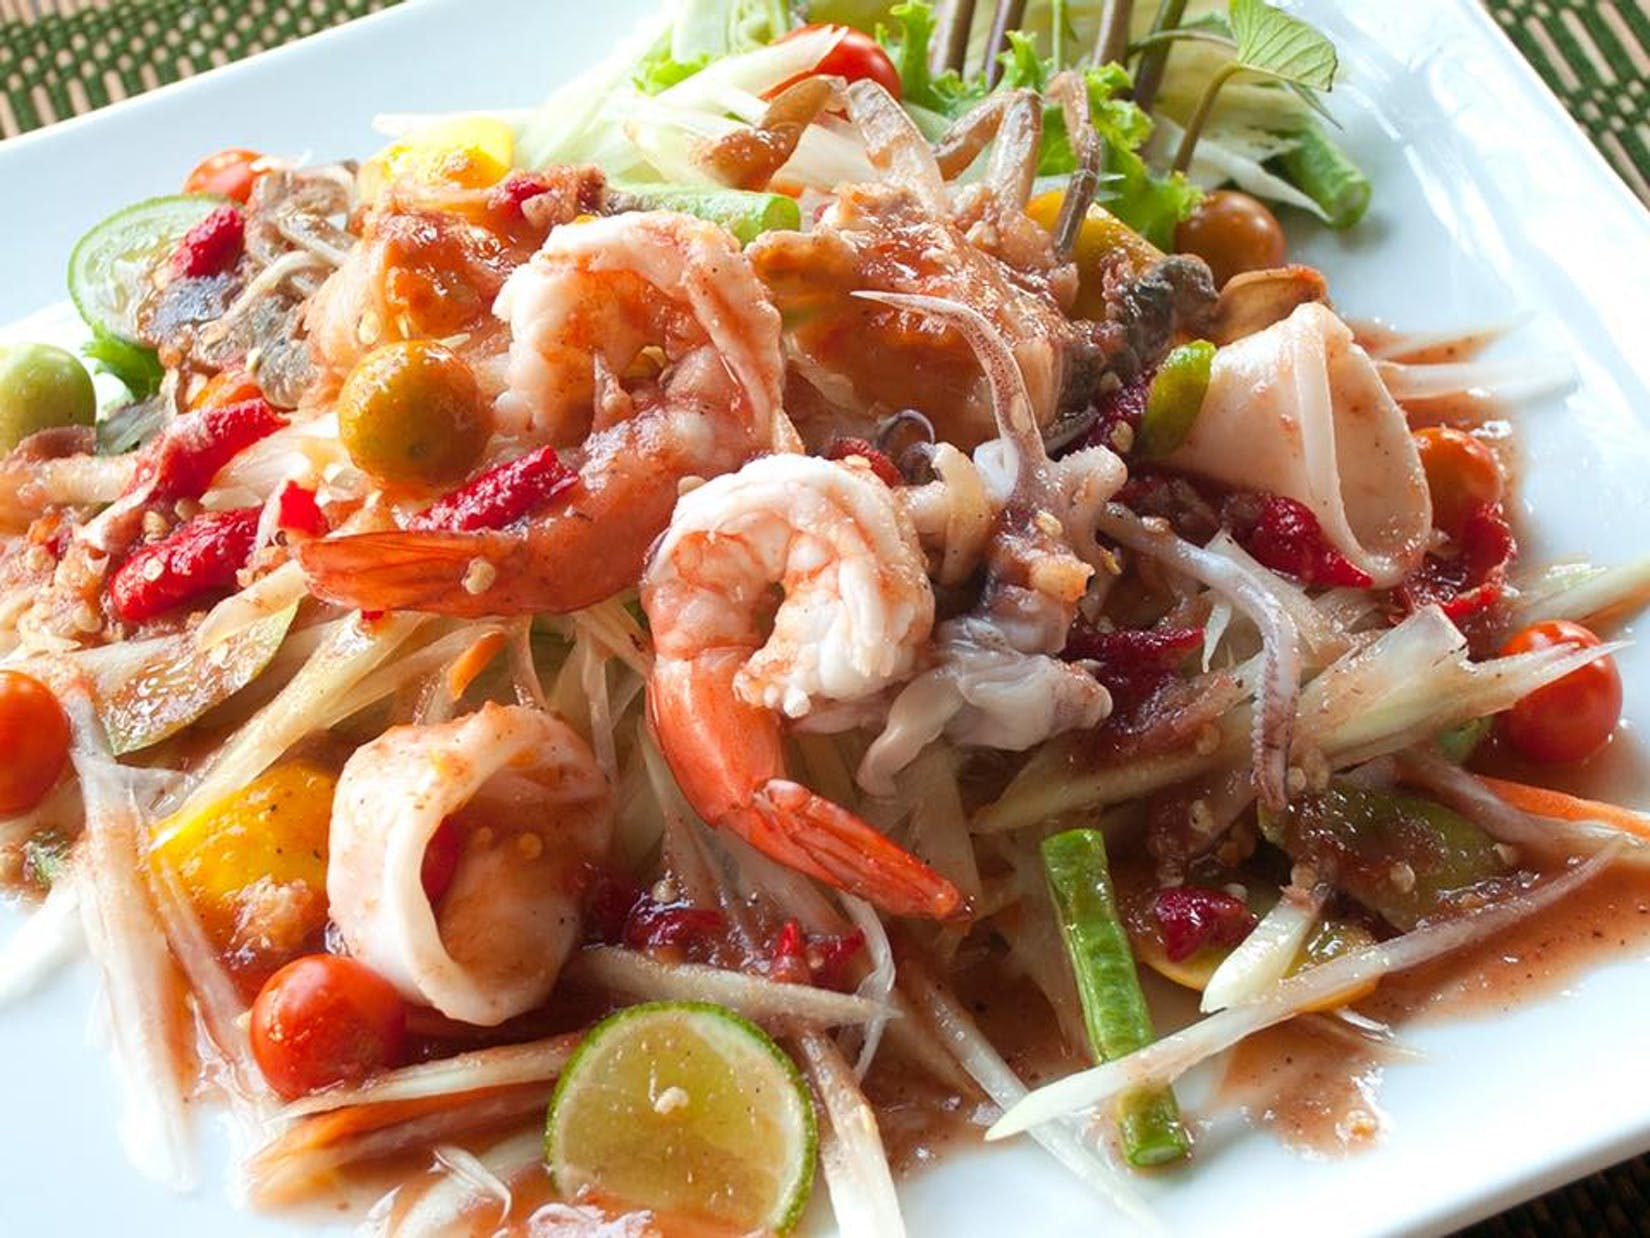 Phoo Pwint Food & Snack Bar | yathar